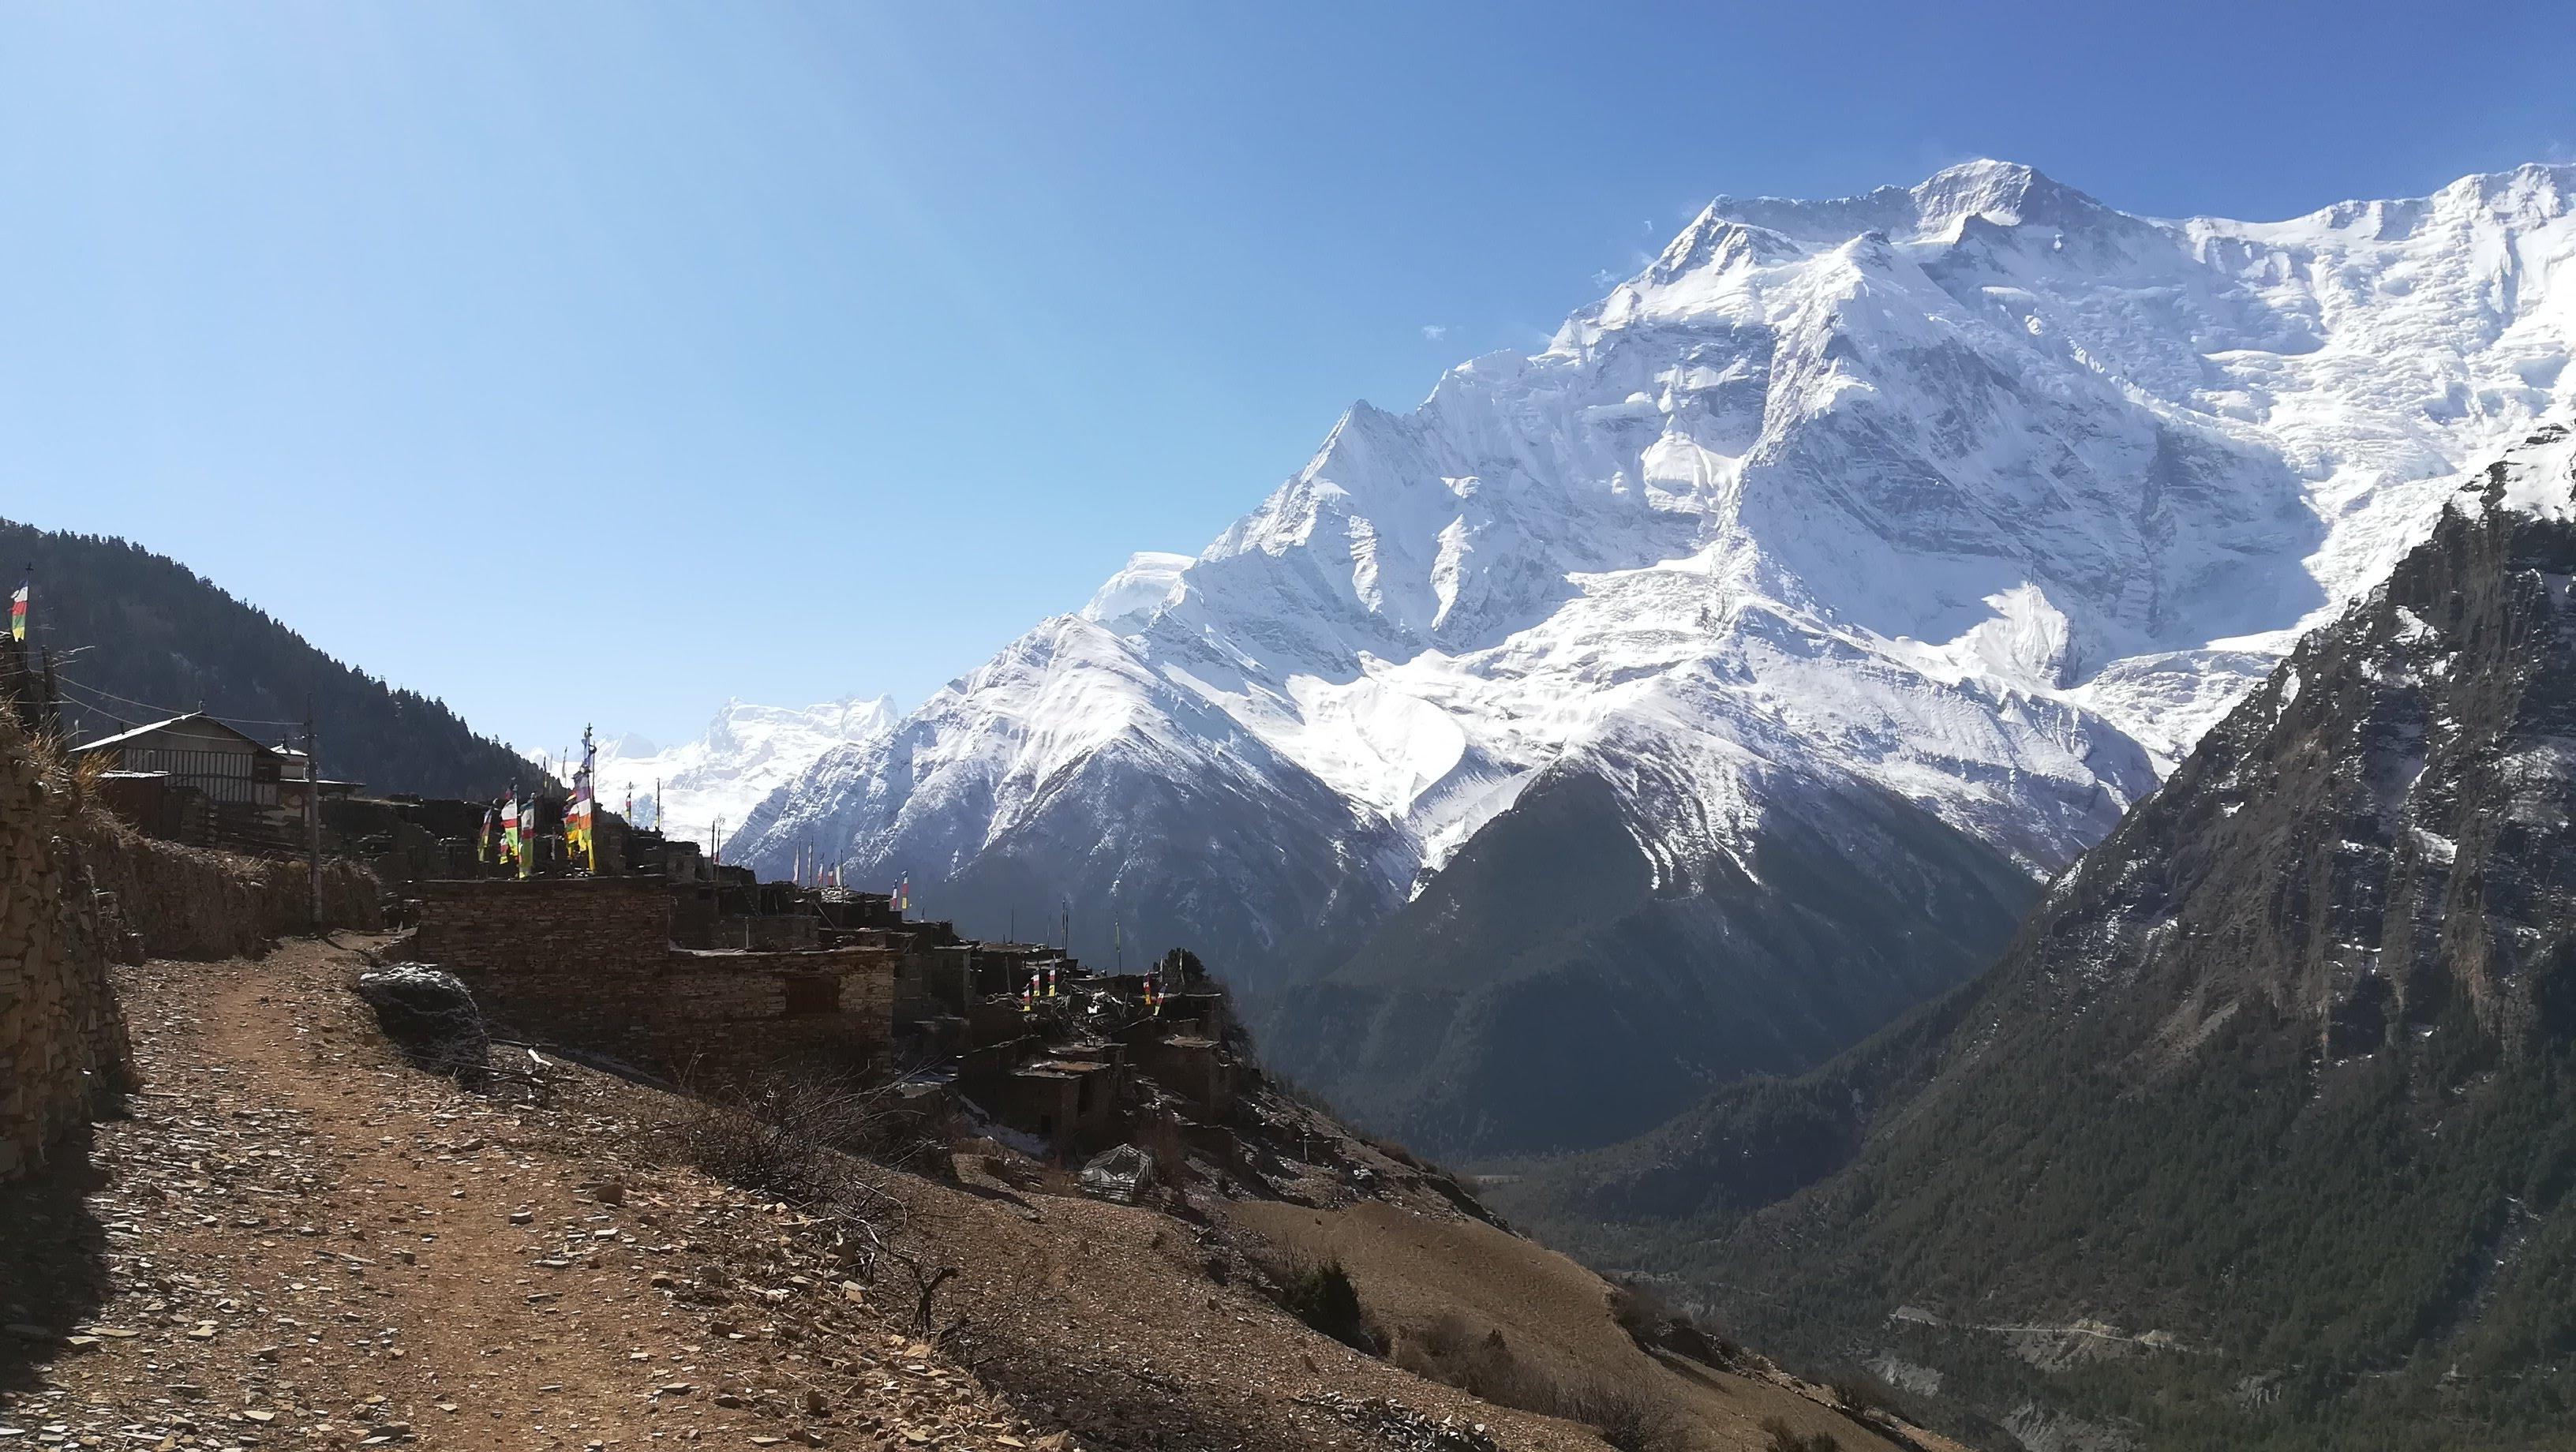 Annapurna view